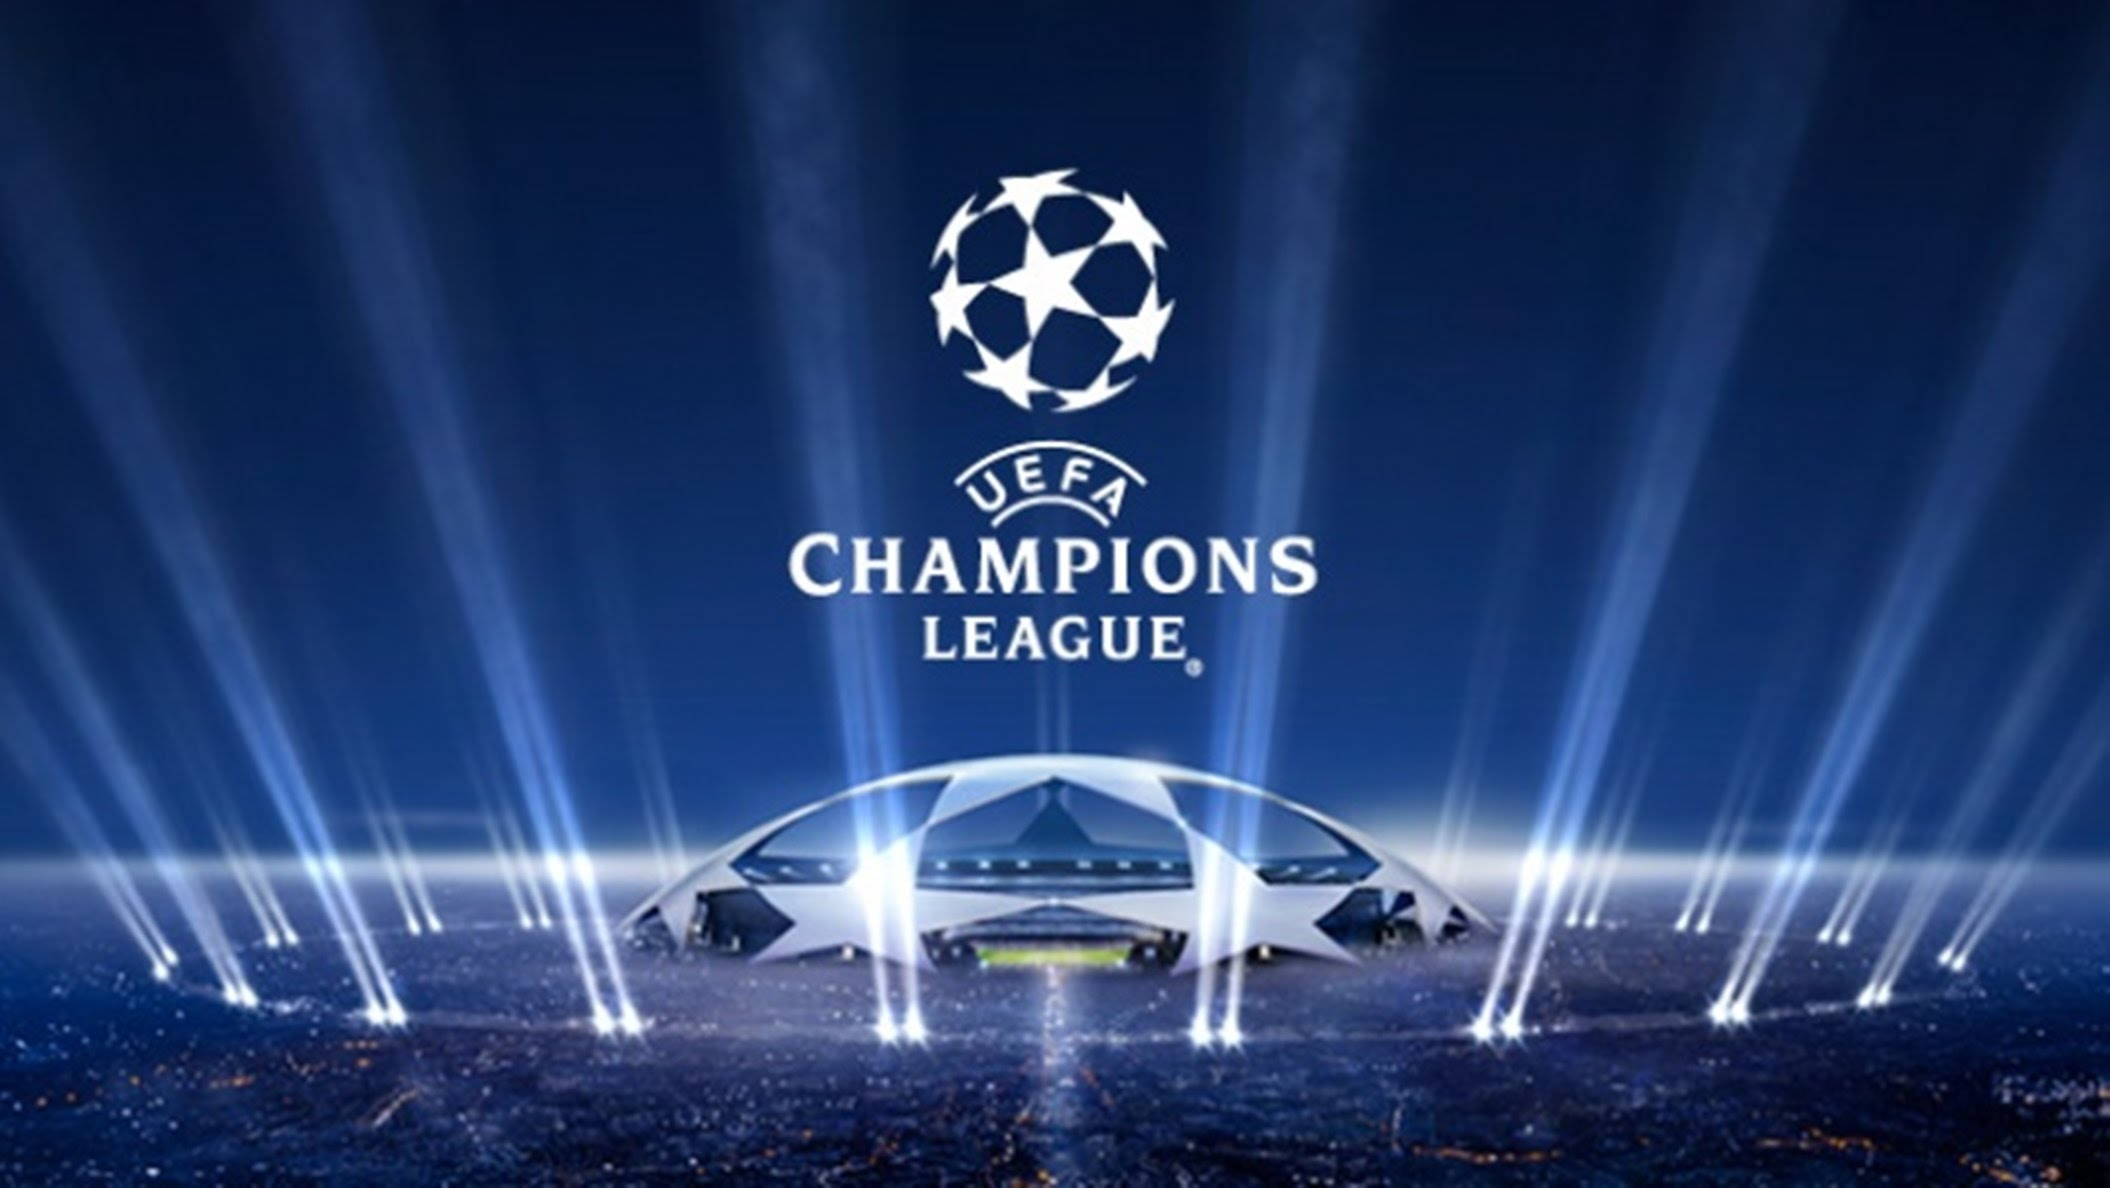 champions league tv mediaset